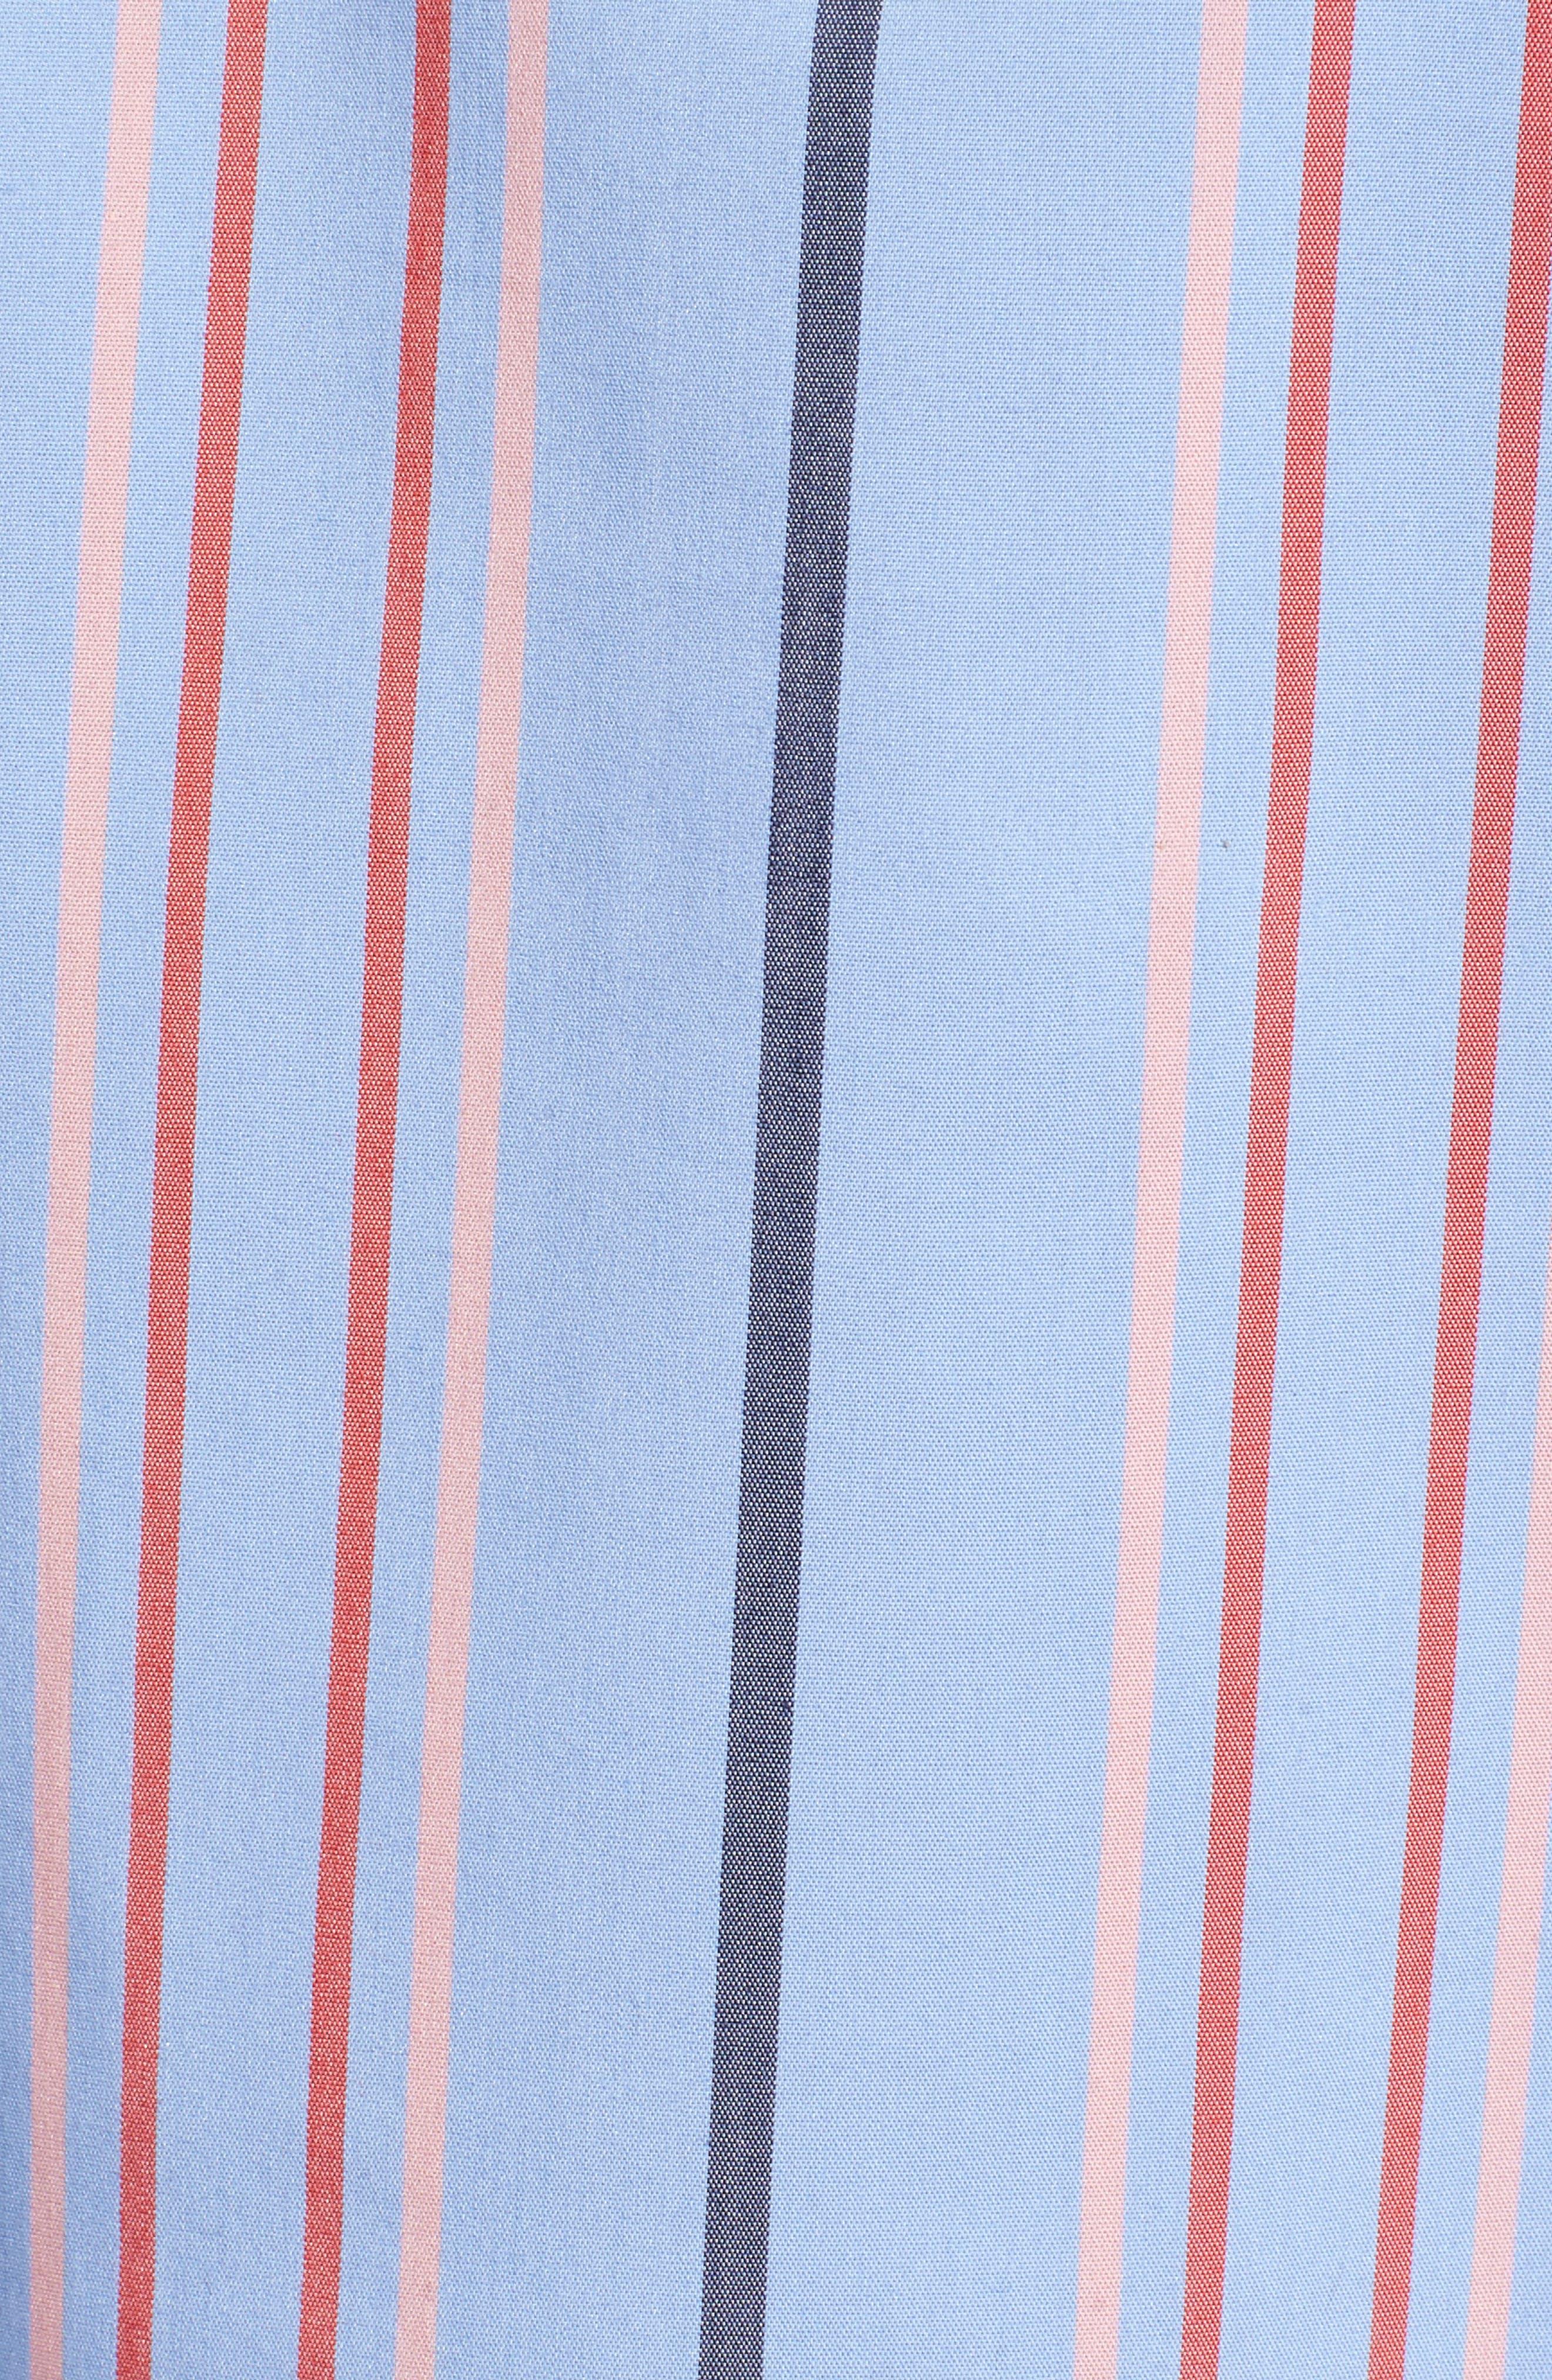 Ruffle Detail Poplin Shirt,                             Alternate thumbnail 5, color,                             Blue Multi Stripe